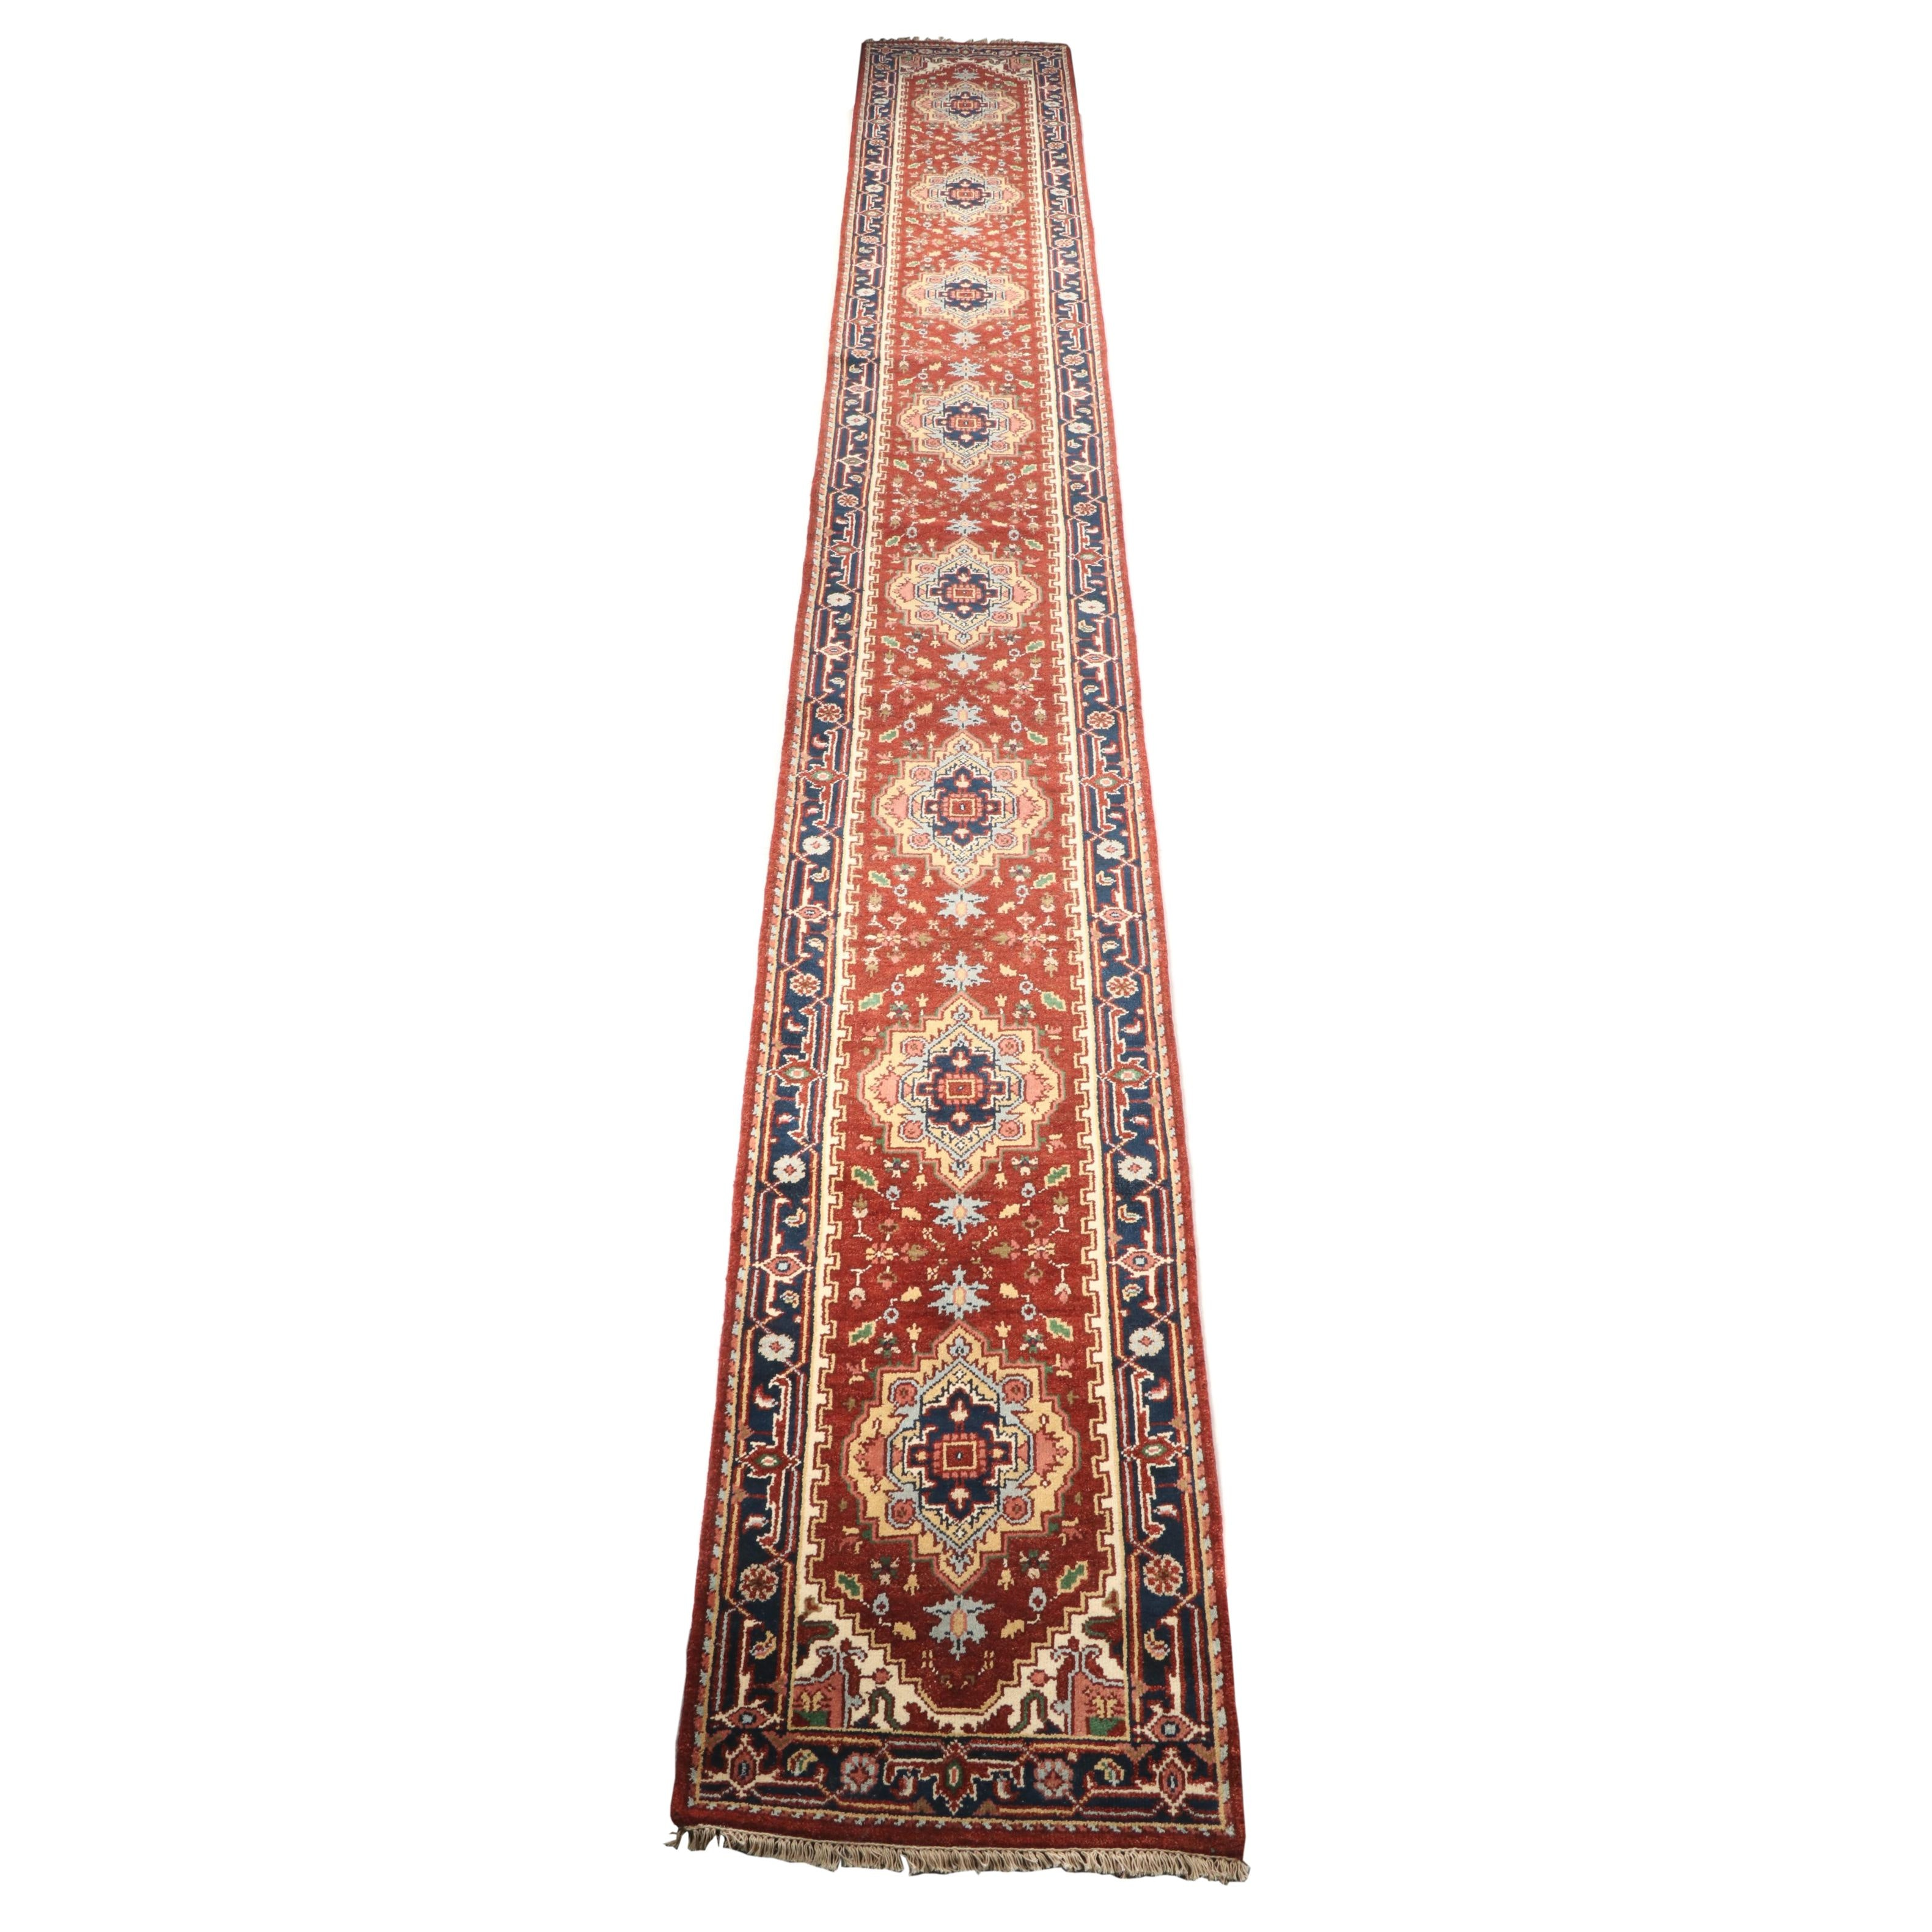 Hand-Knotted Indo-Persian Heriz Wool Carpet Runner